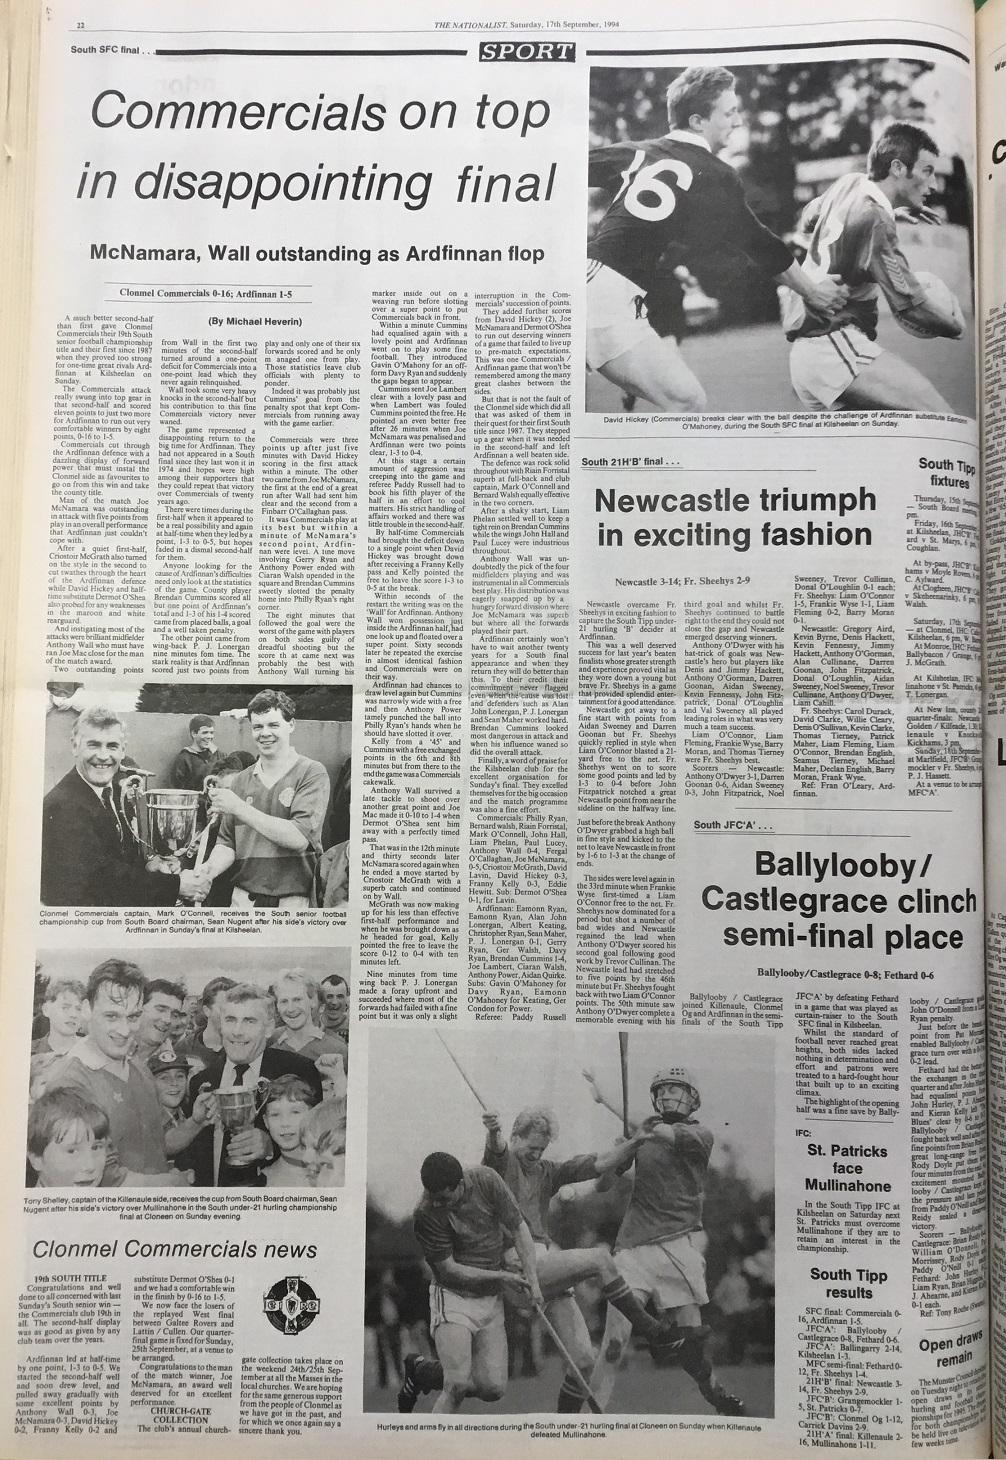 1994 South football final